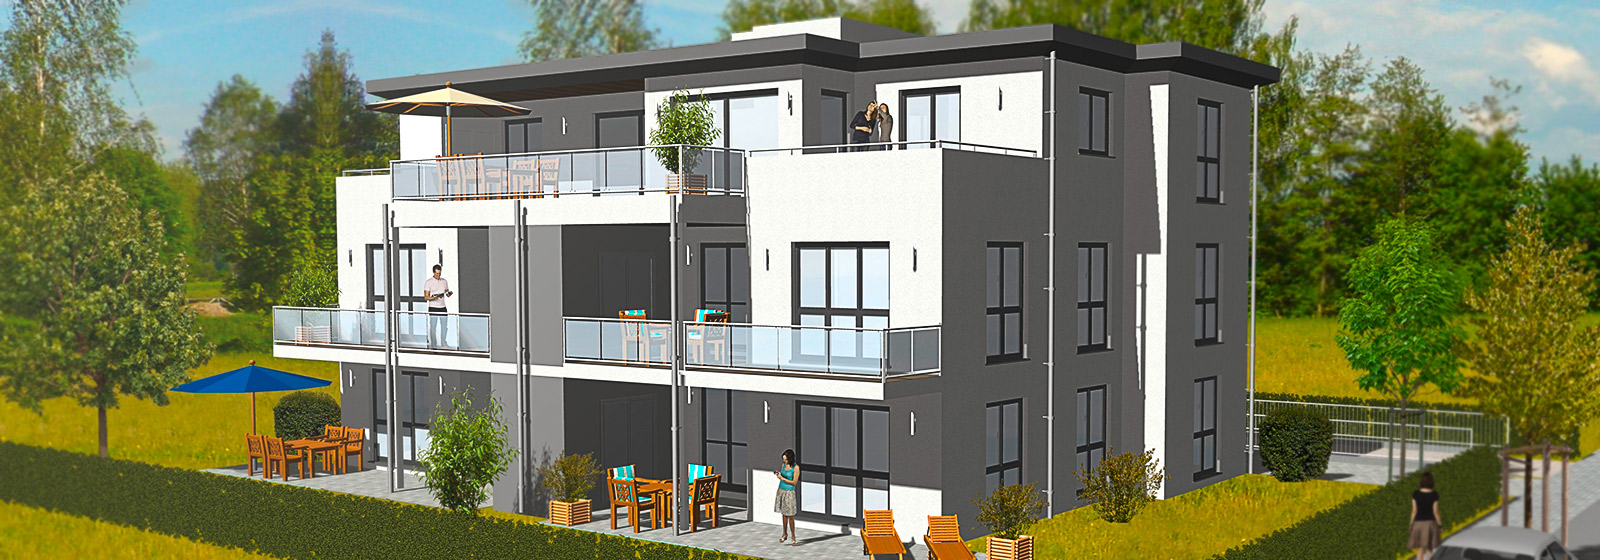 Mehrfamilienhaus mit Tiefgarage